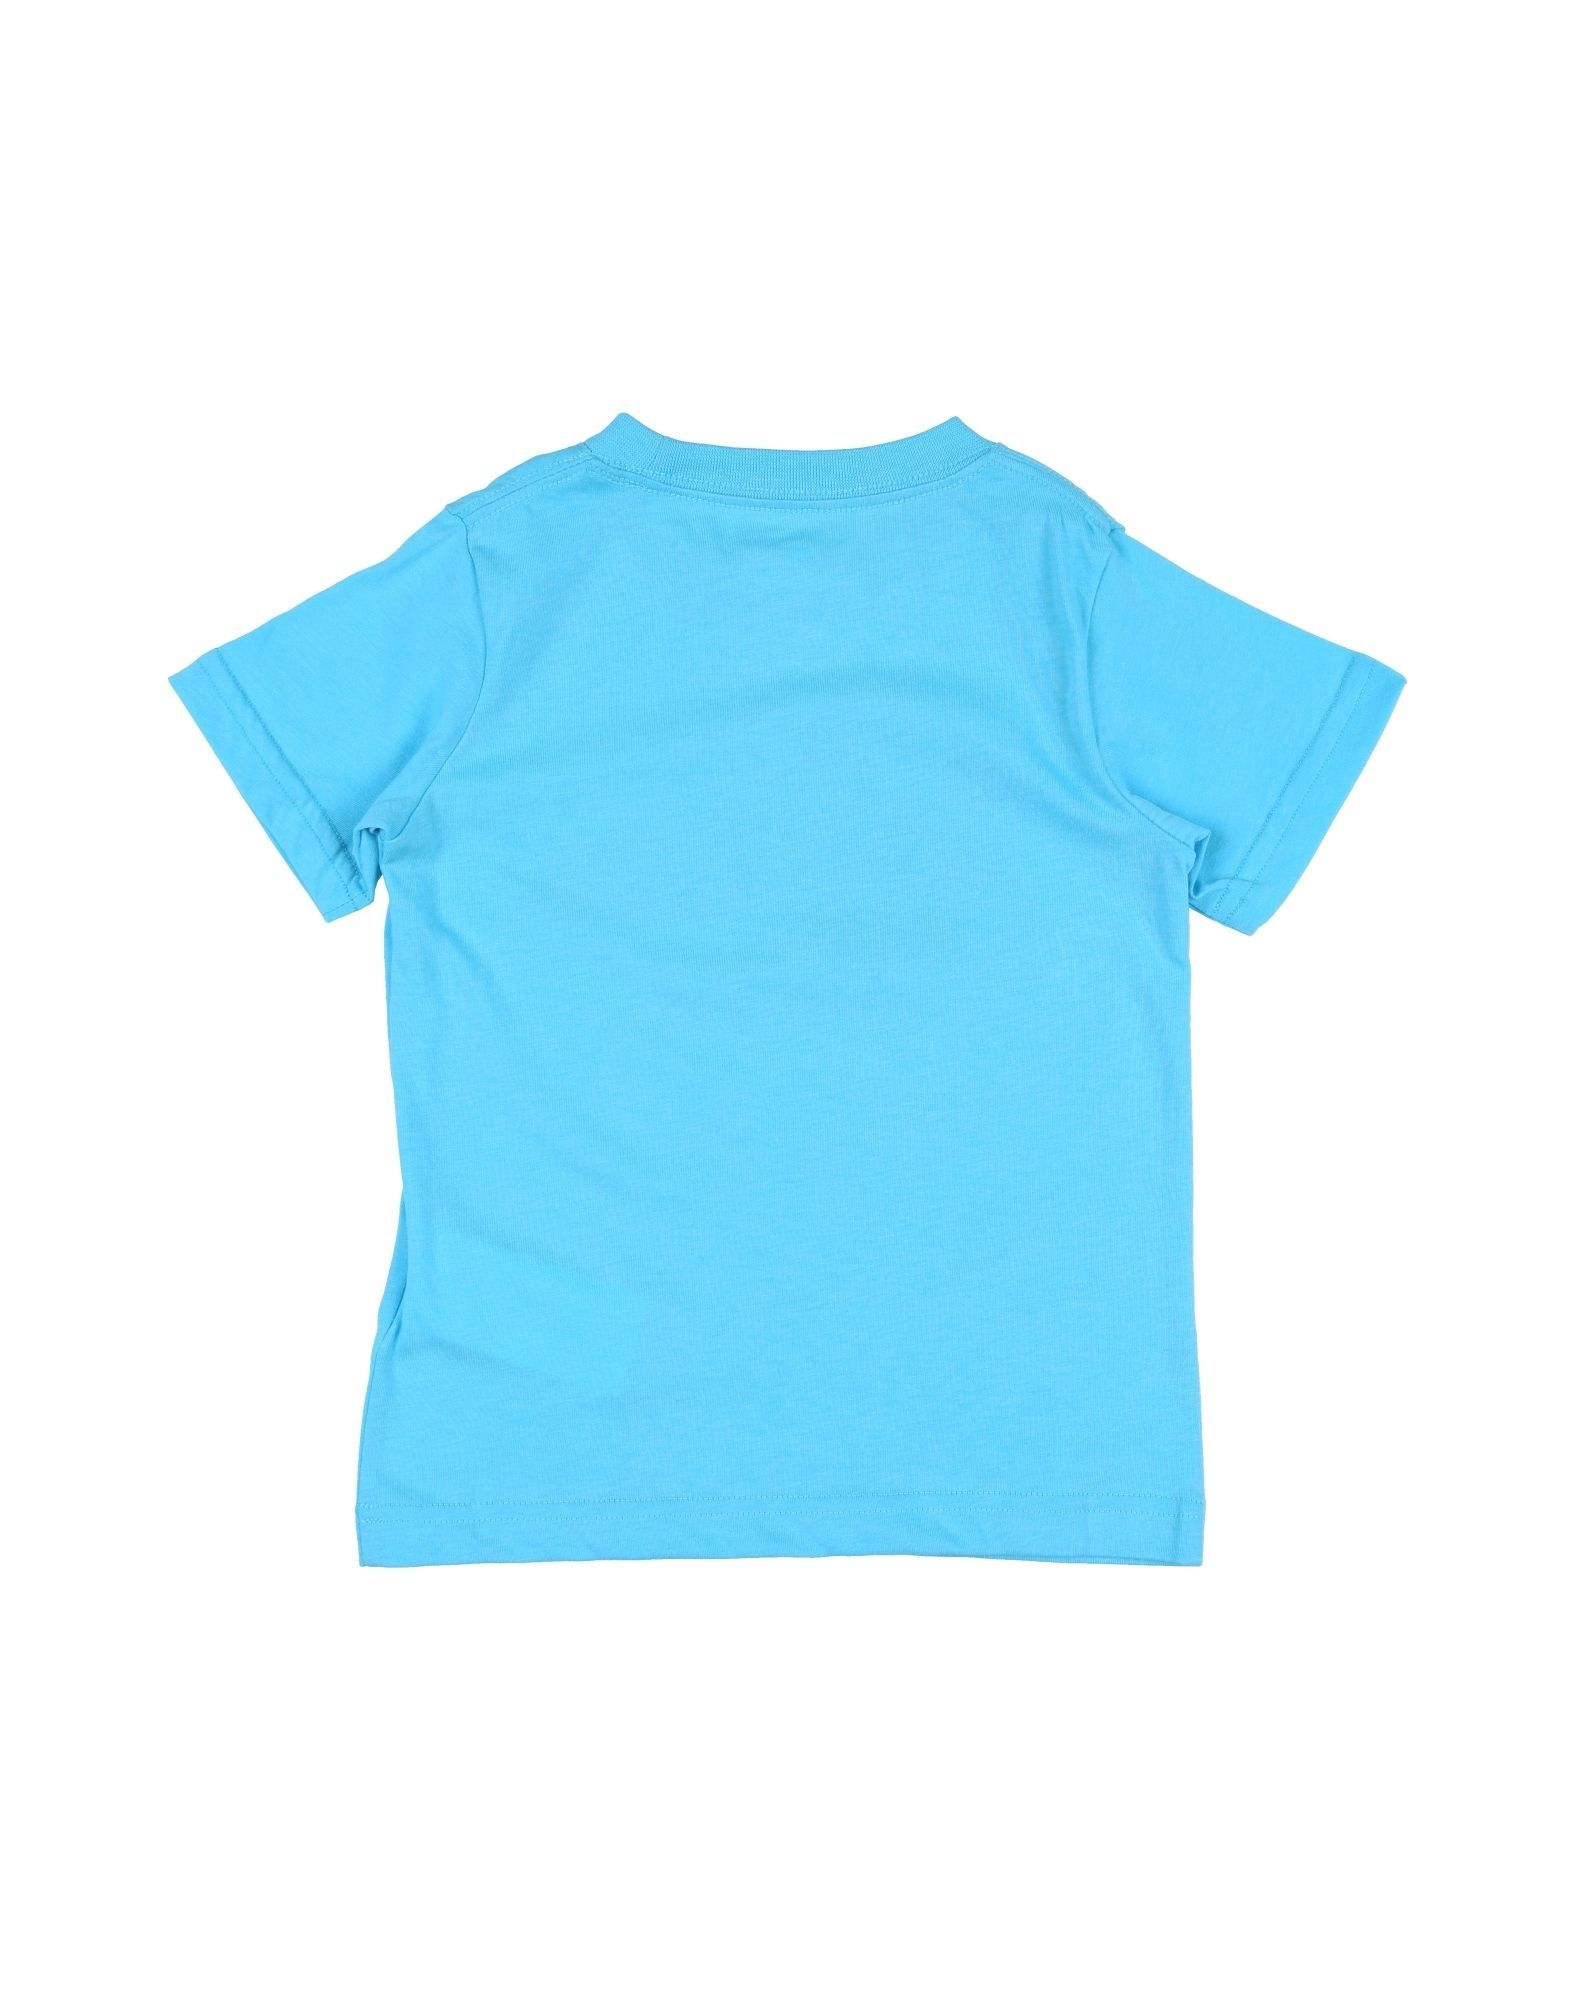 TOPS & TEES Nike Blue Boy Cotton